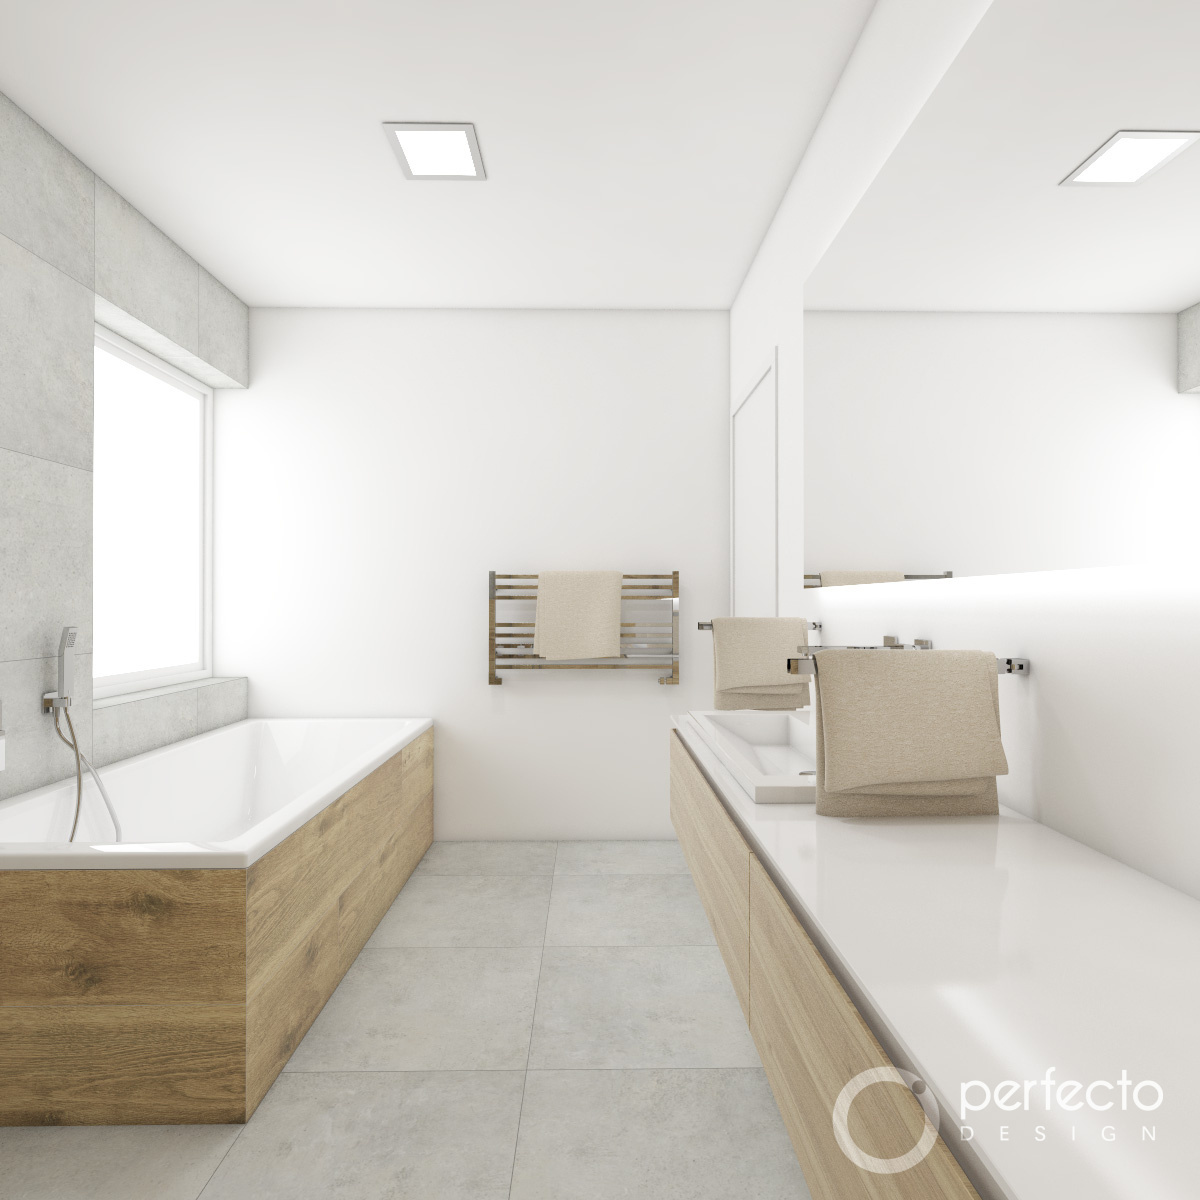 natur-badezimmer alpine | perfecto design, Badezimmer